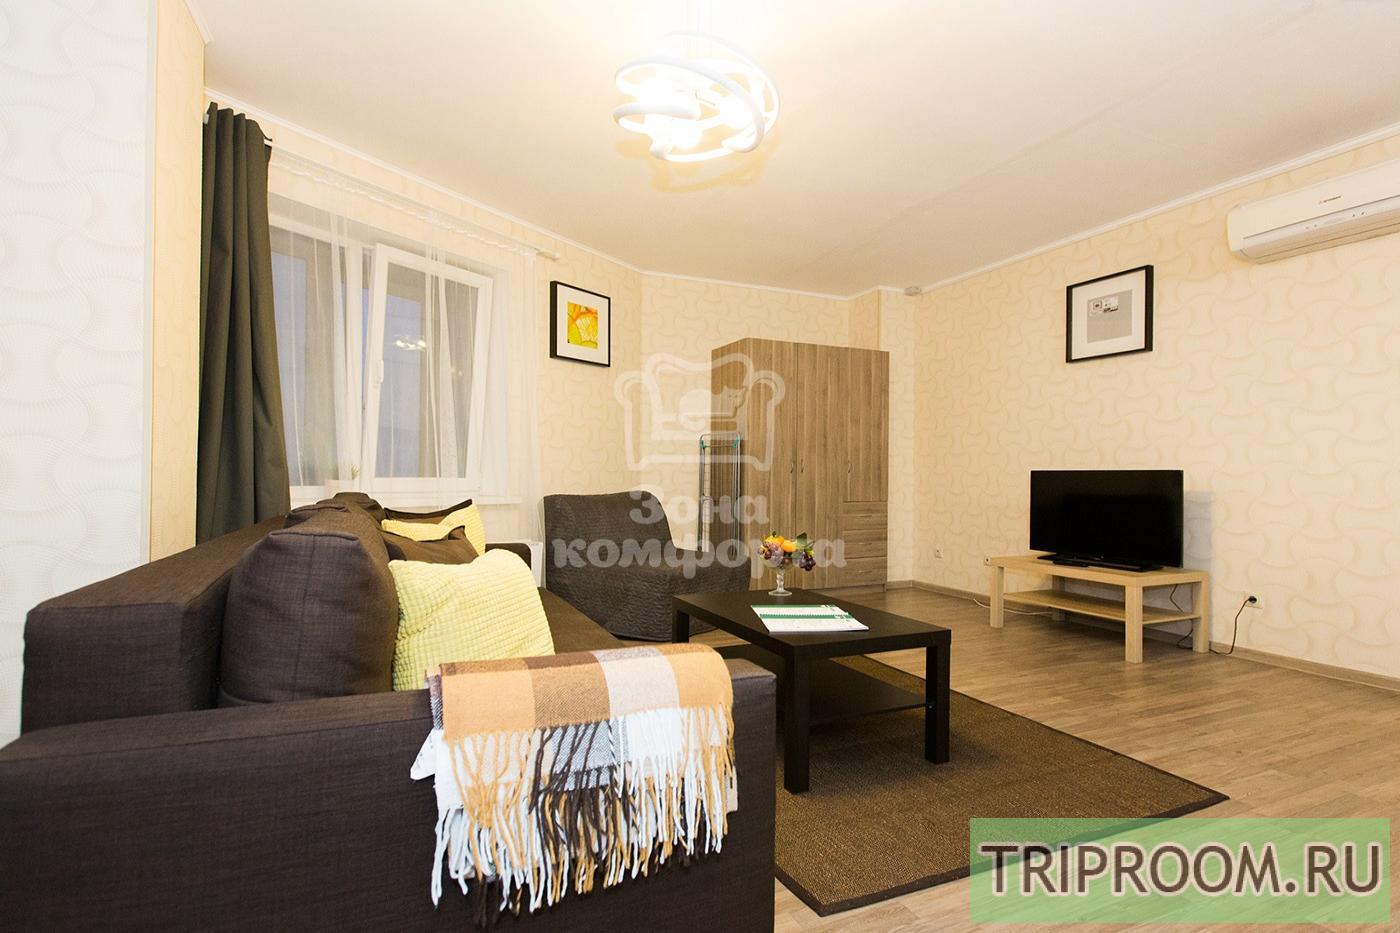 2-комнатная квартира посуточно (вариант № 34715), ул. Гагарина бульвар, фото № 20